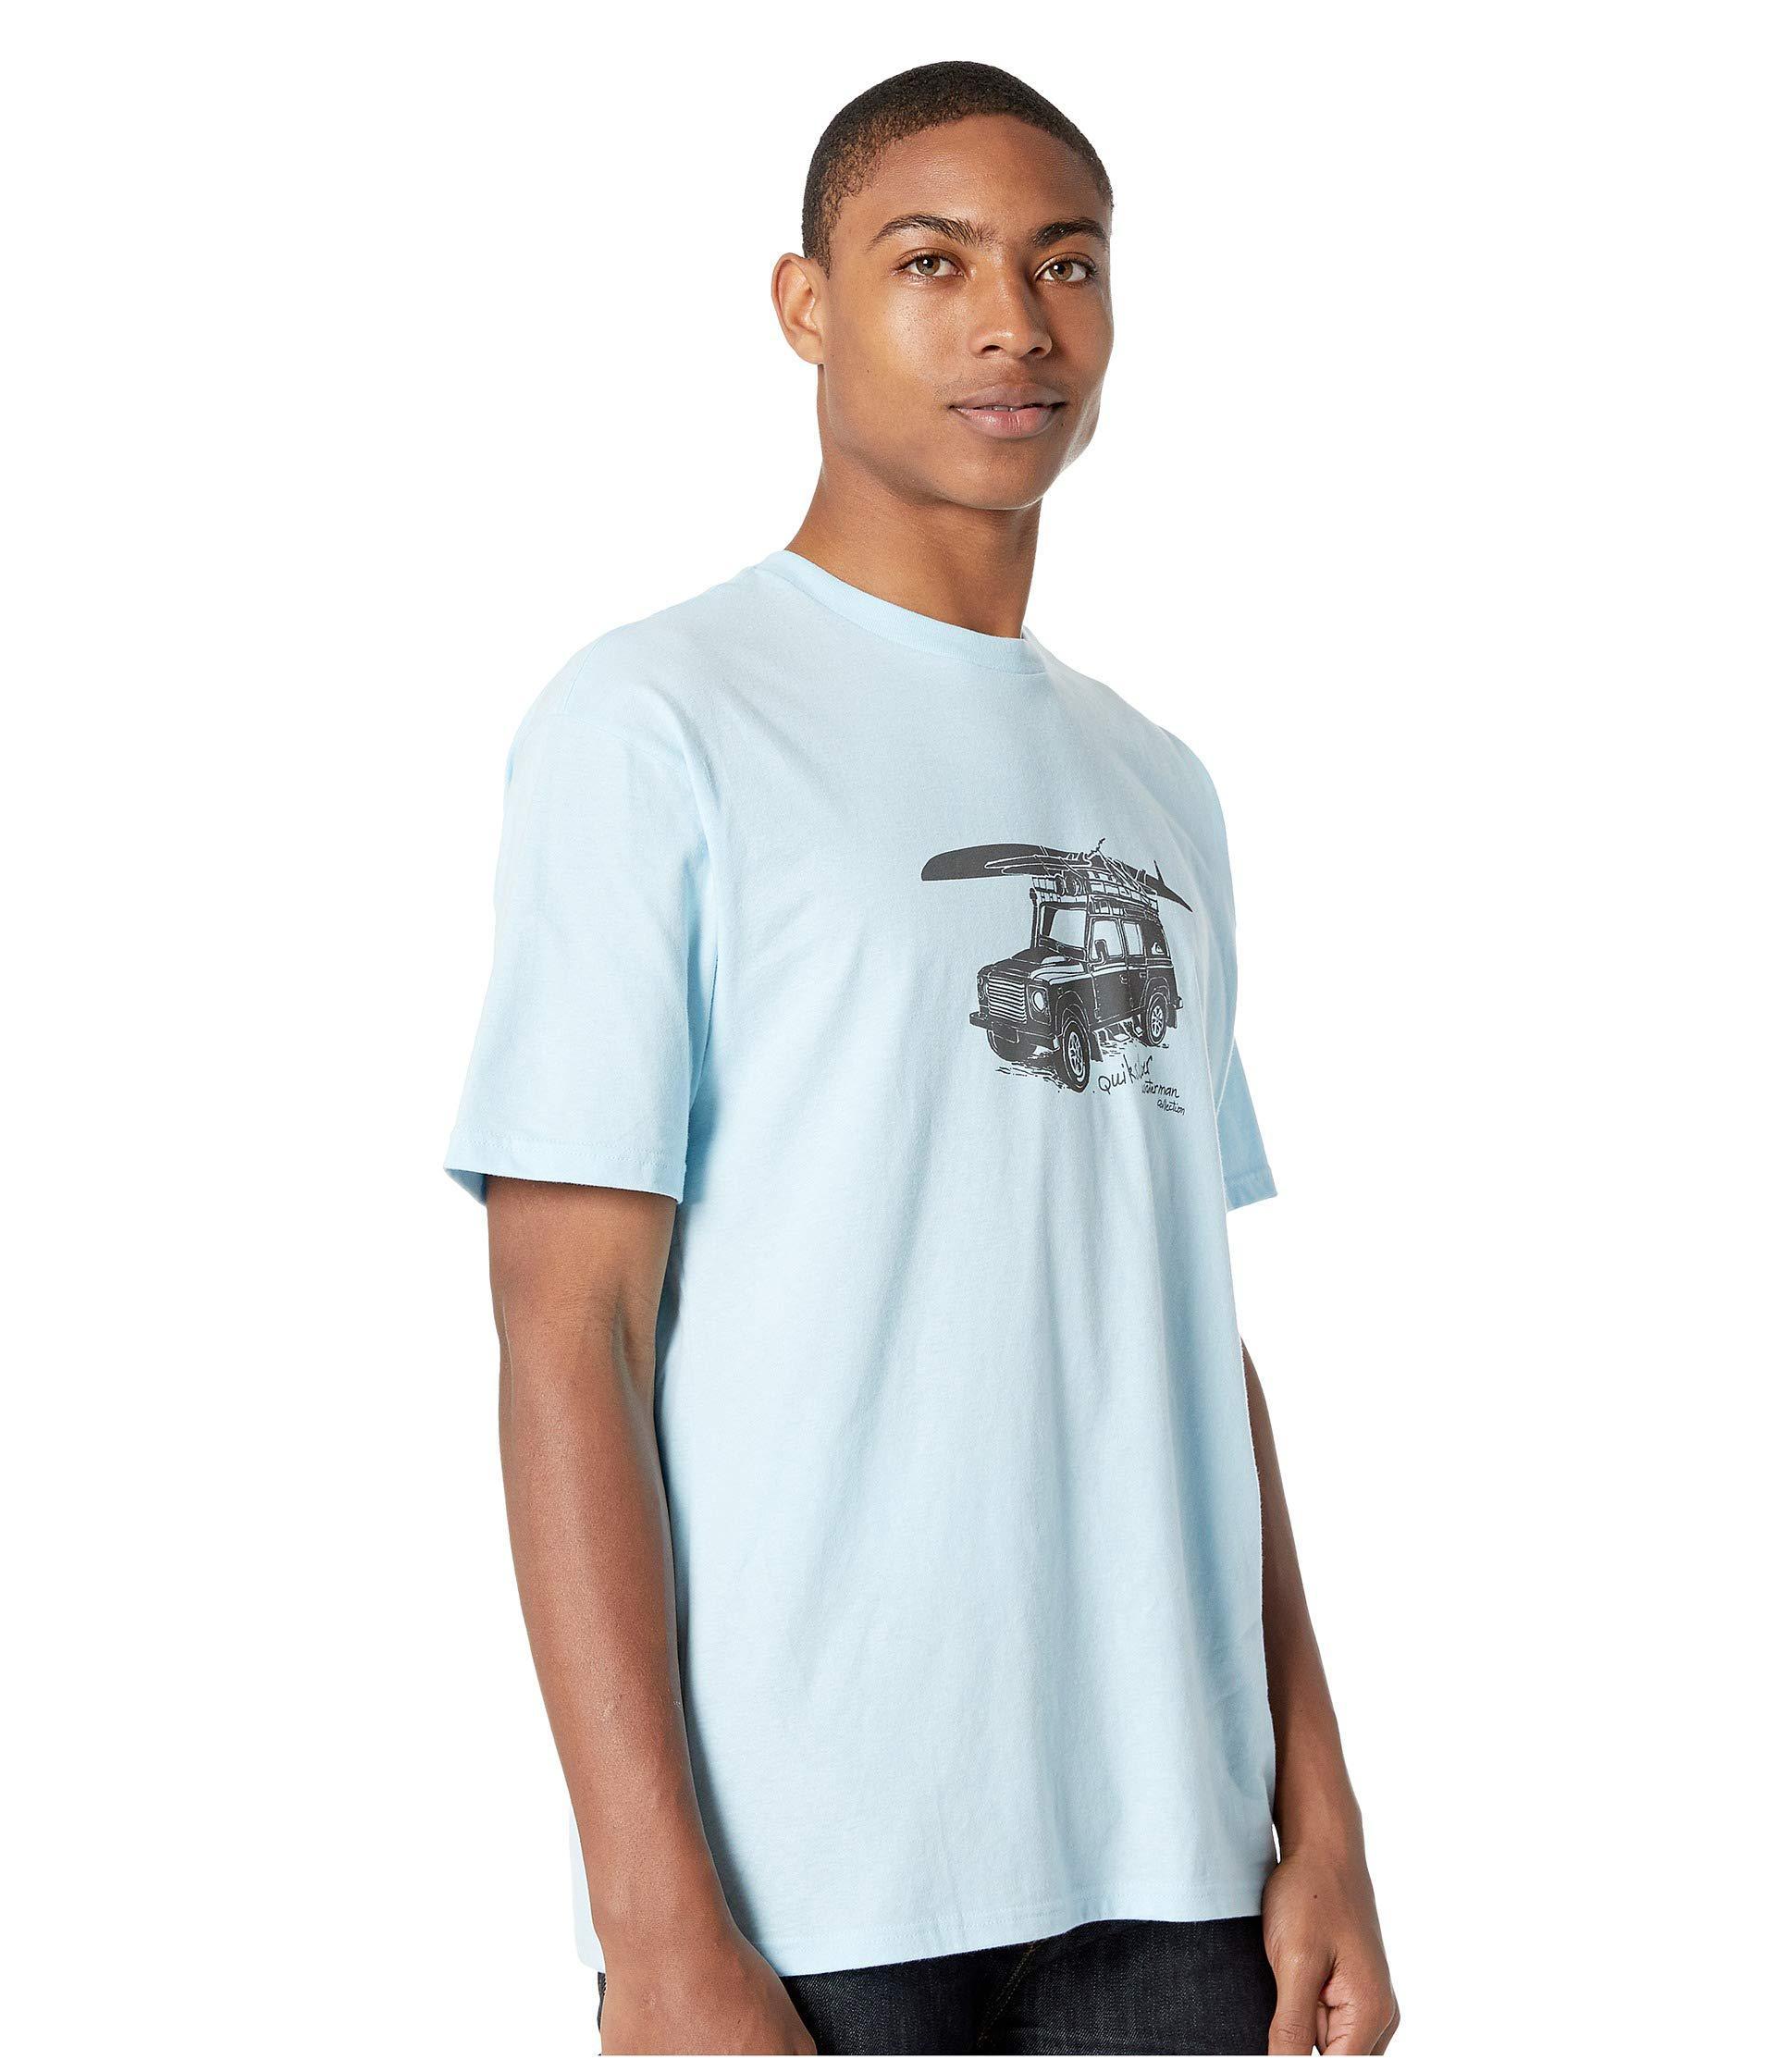 ba017a662c Lyst - Quiksilver Seto Gorge Short Sleeve Tee (crystal Blue) Men s T ...